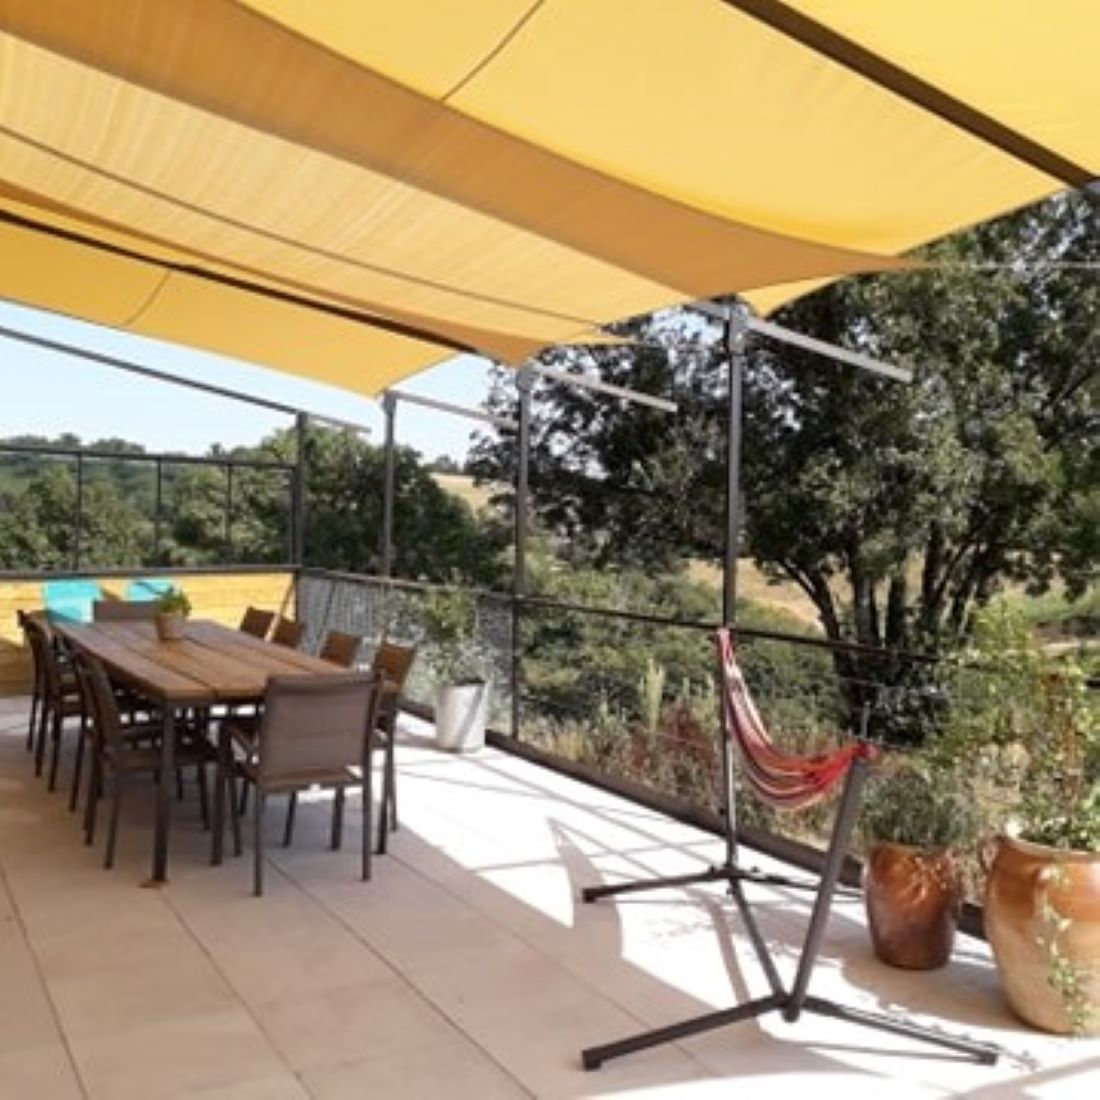 Balkon, hangmat, barbeque